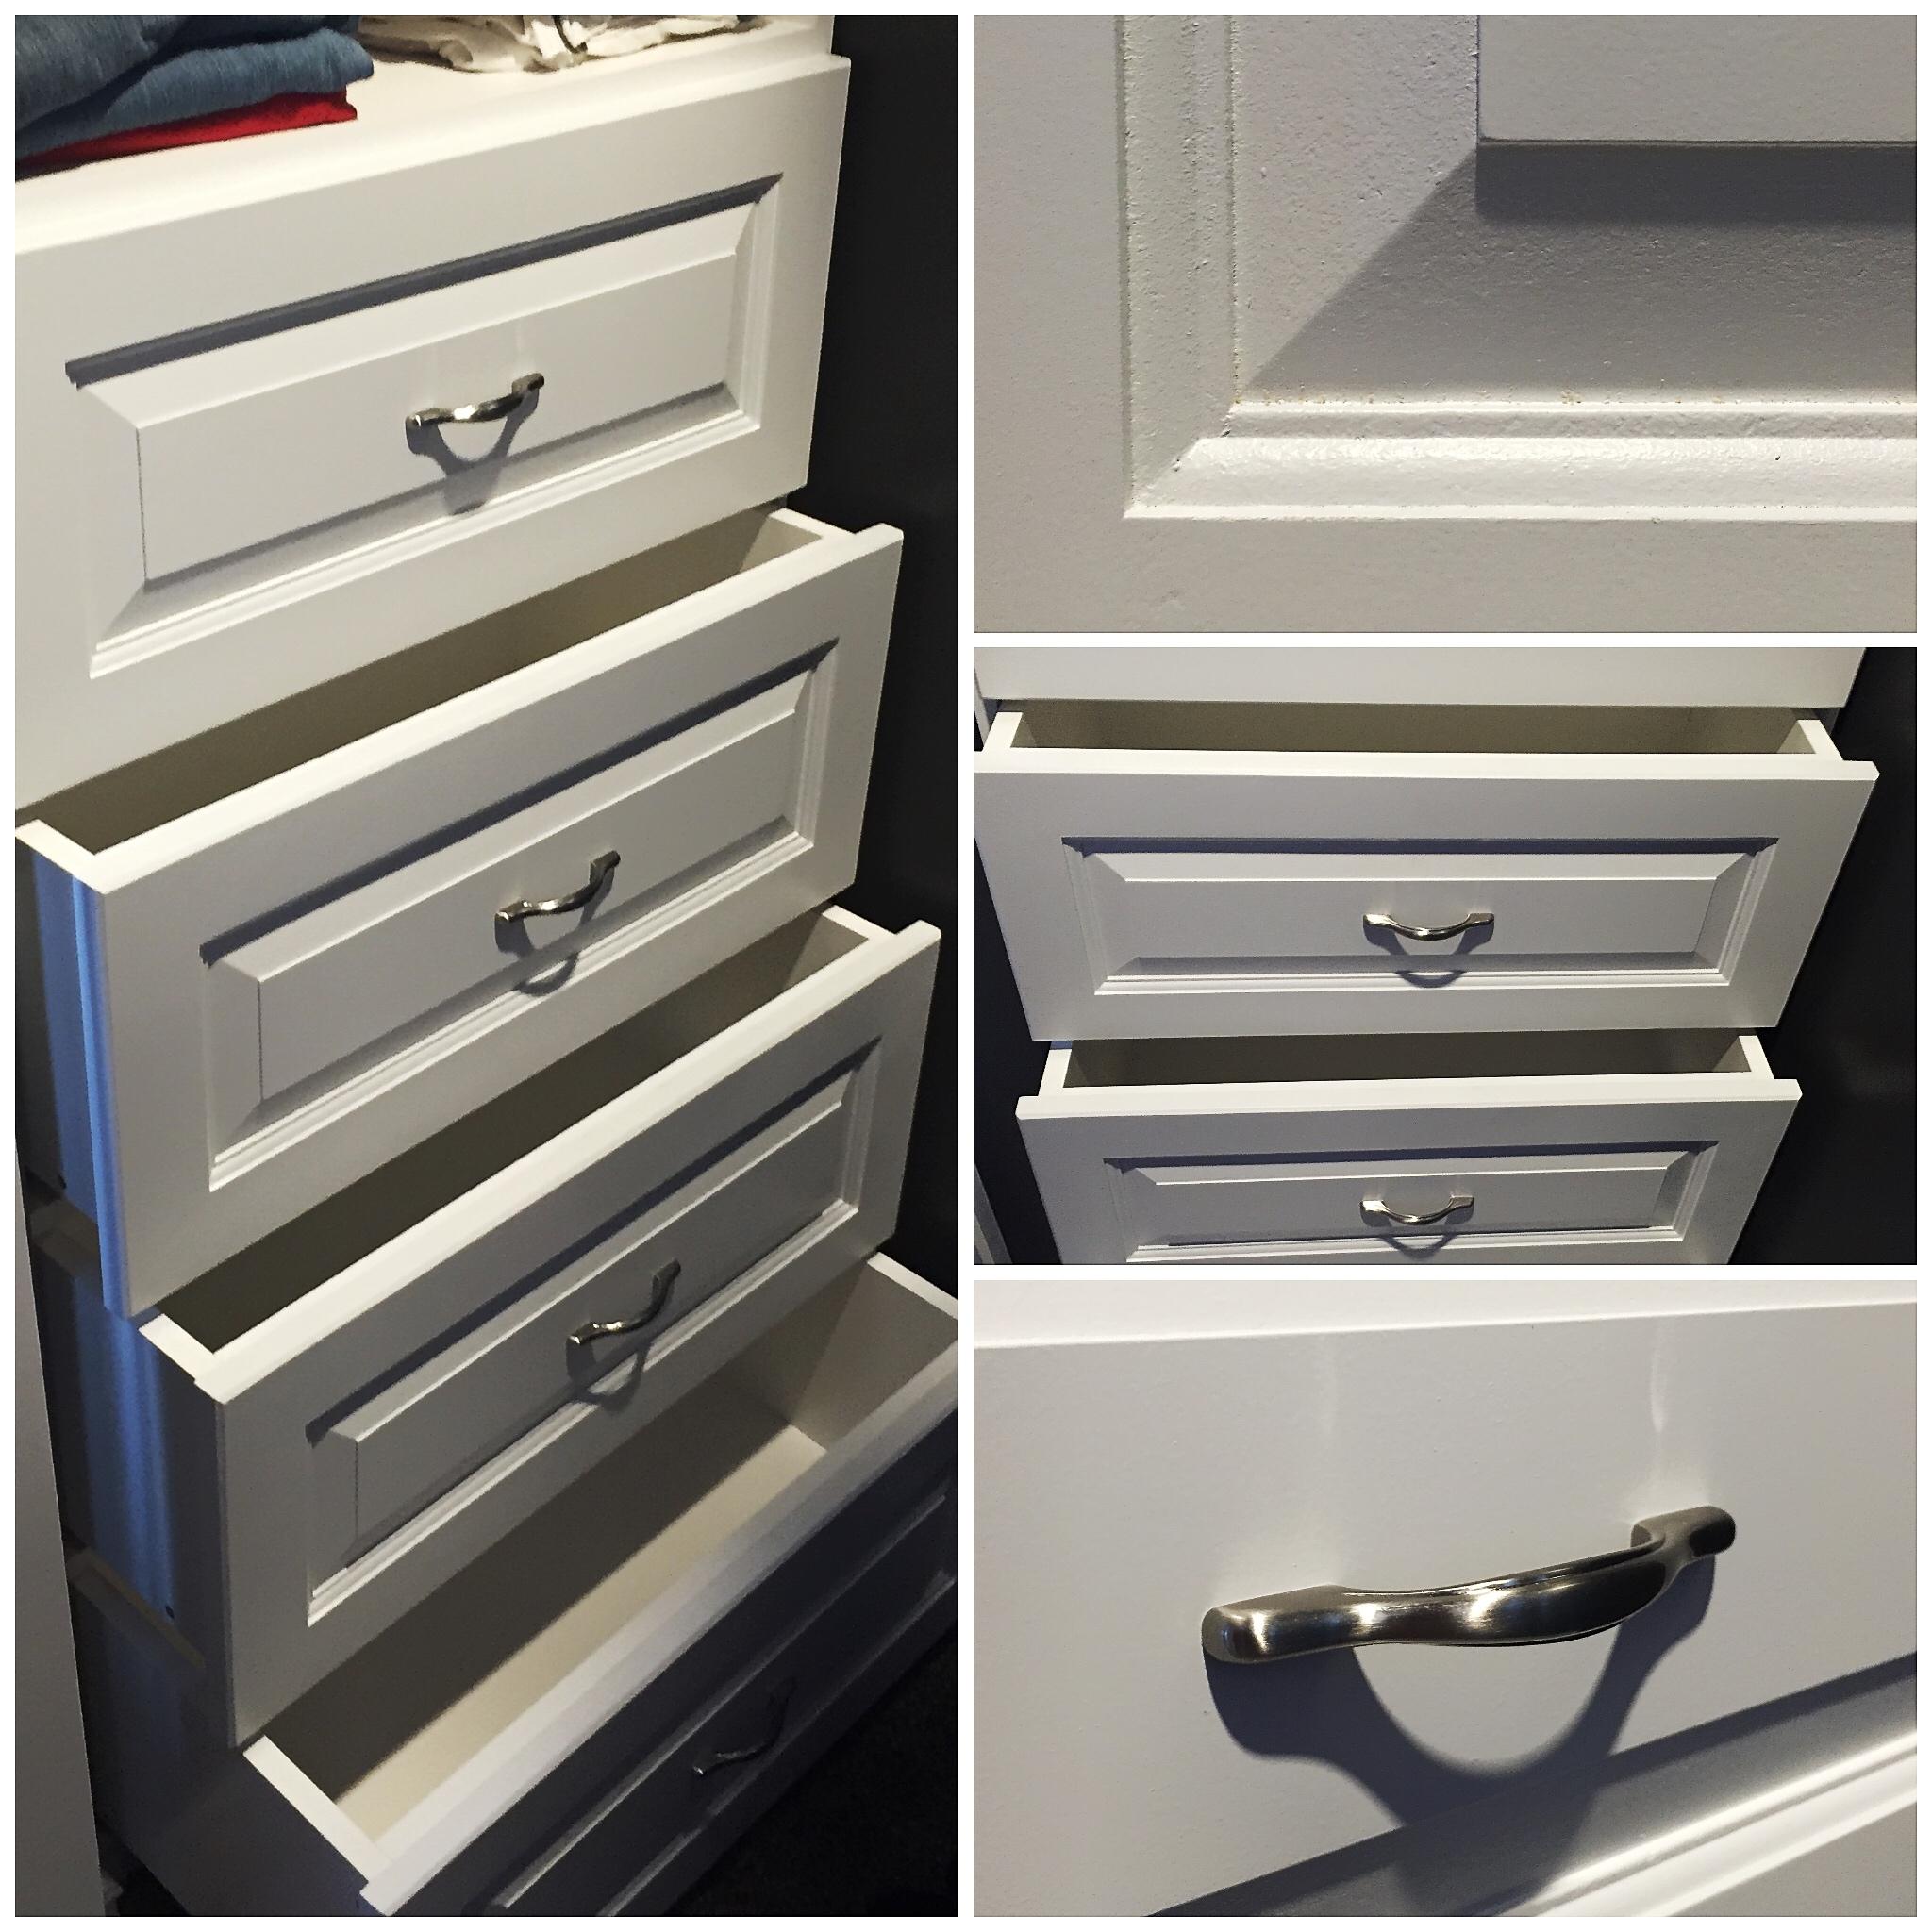 Walk-in Closet Shelf with Drawers